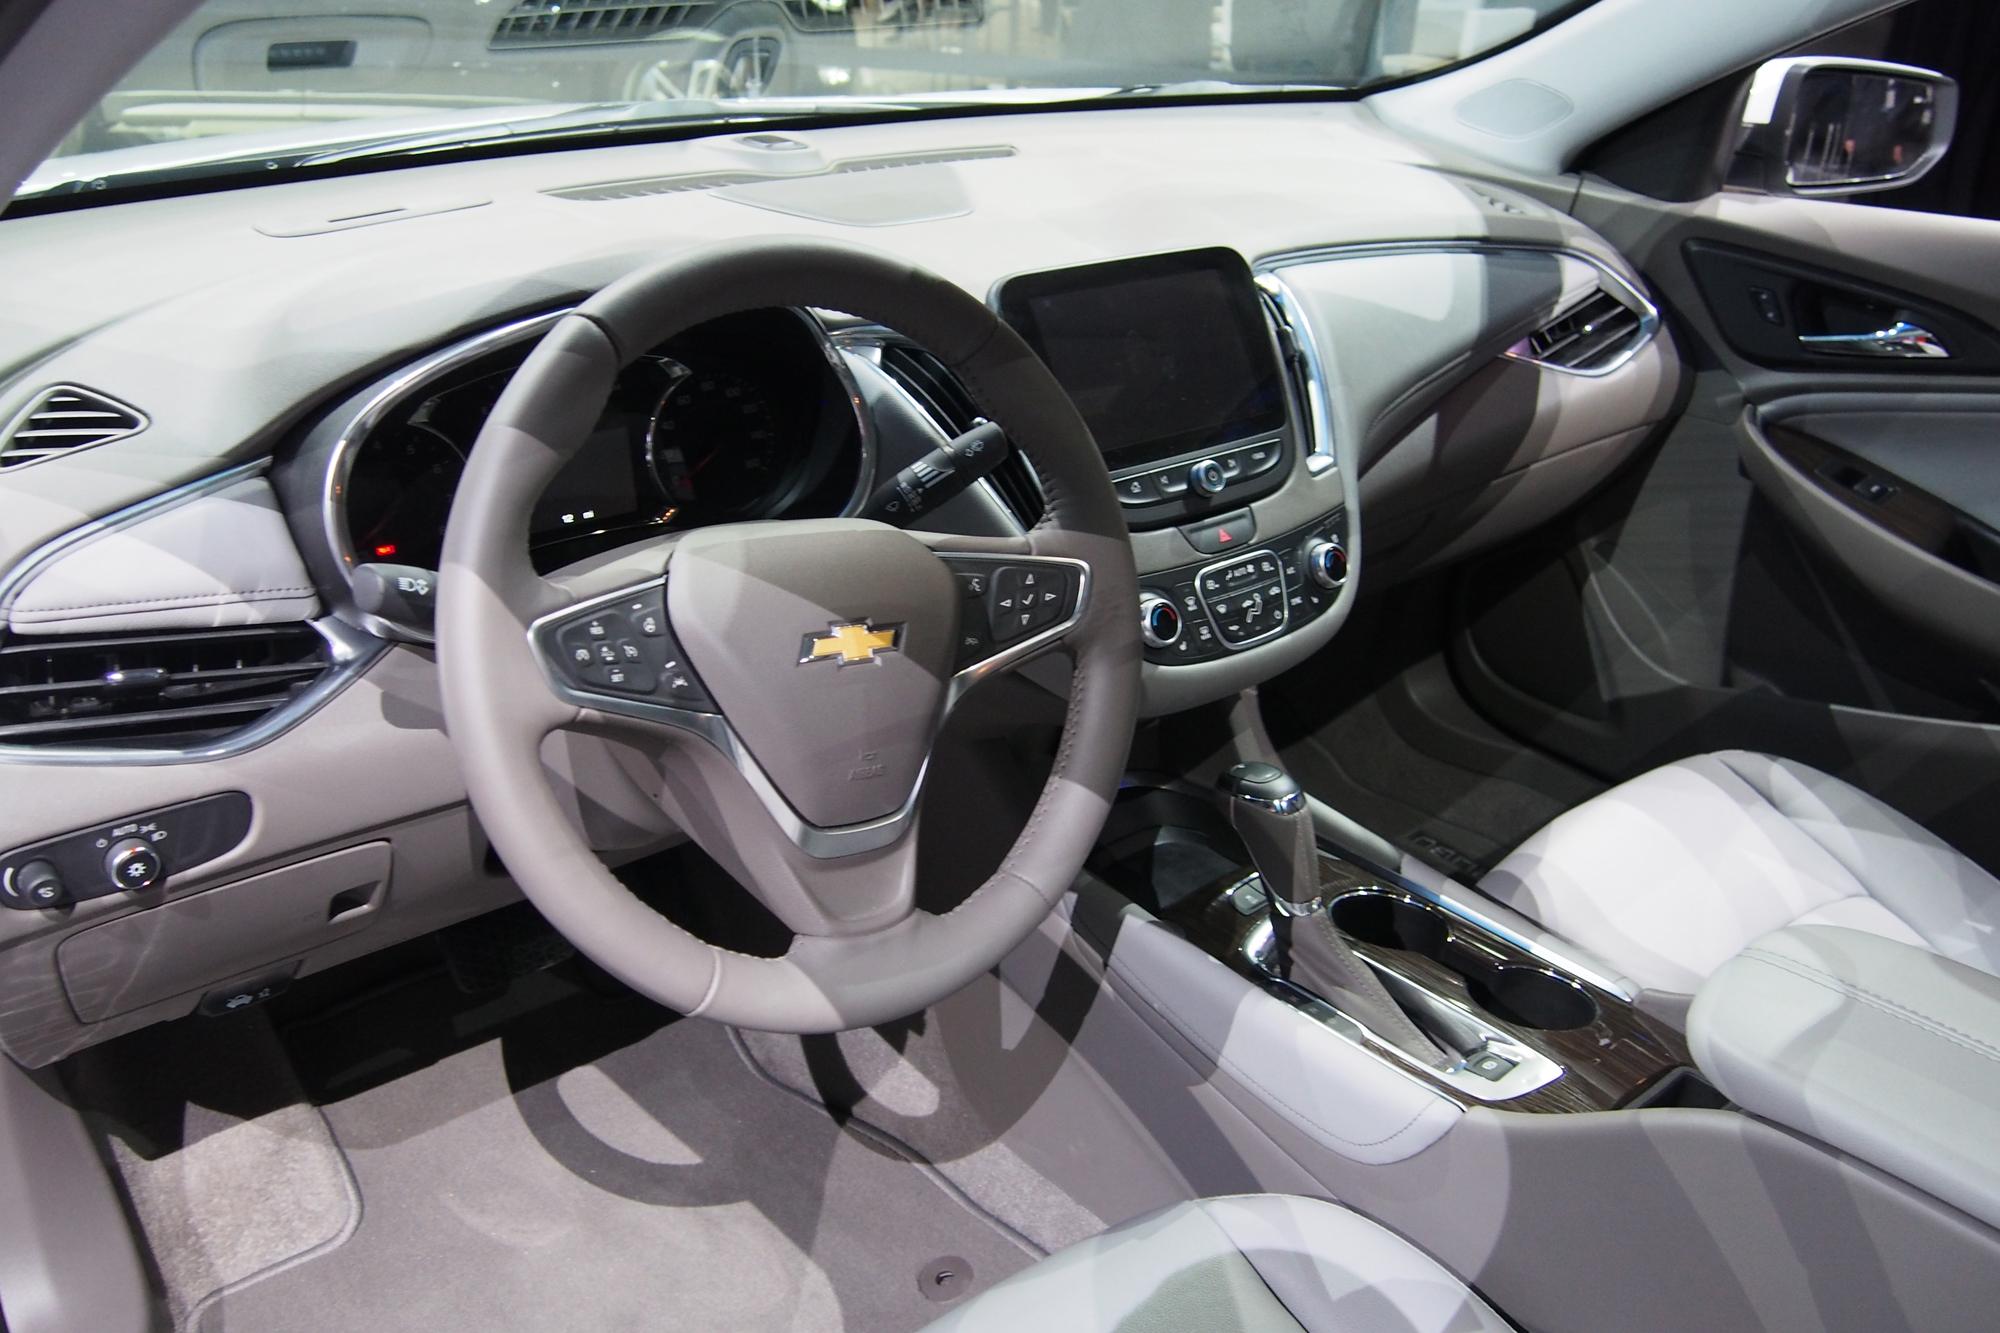 2016 Chevrolet Malibu Video, First Look » AutoGuide.com News